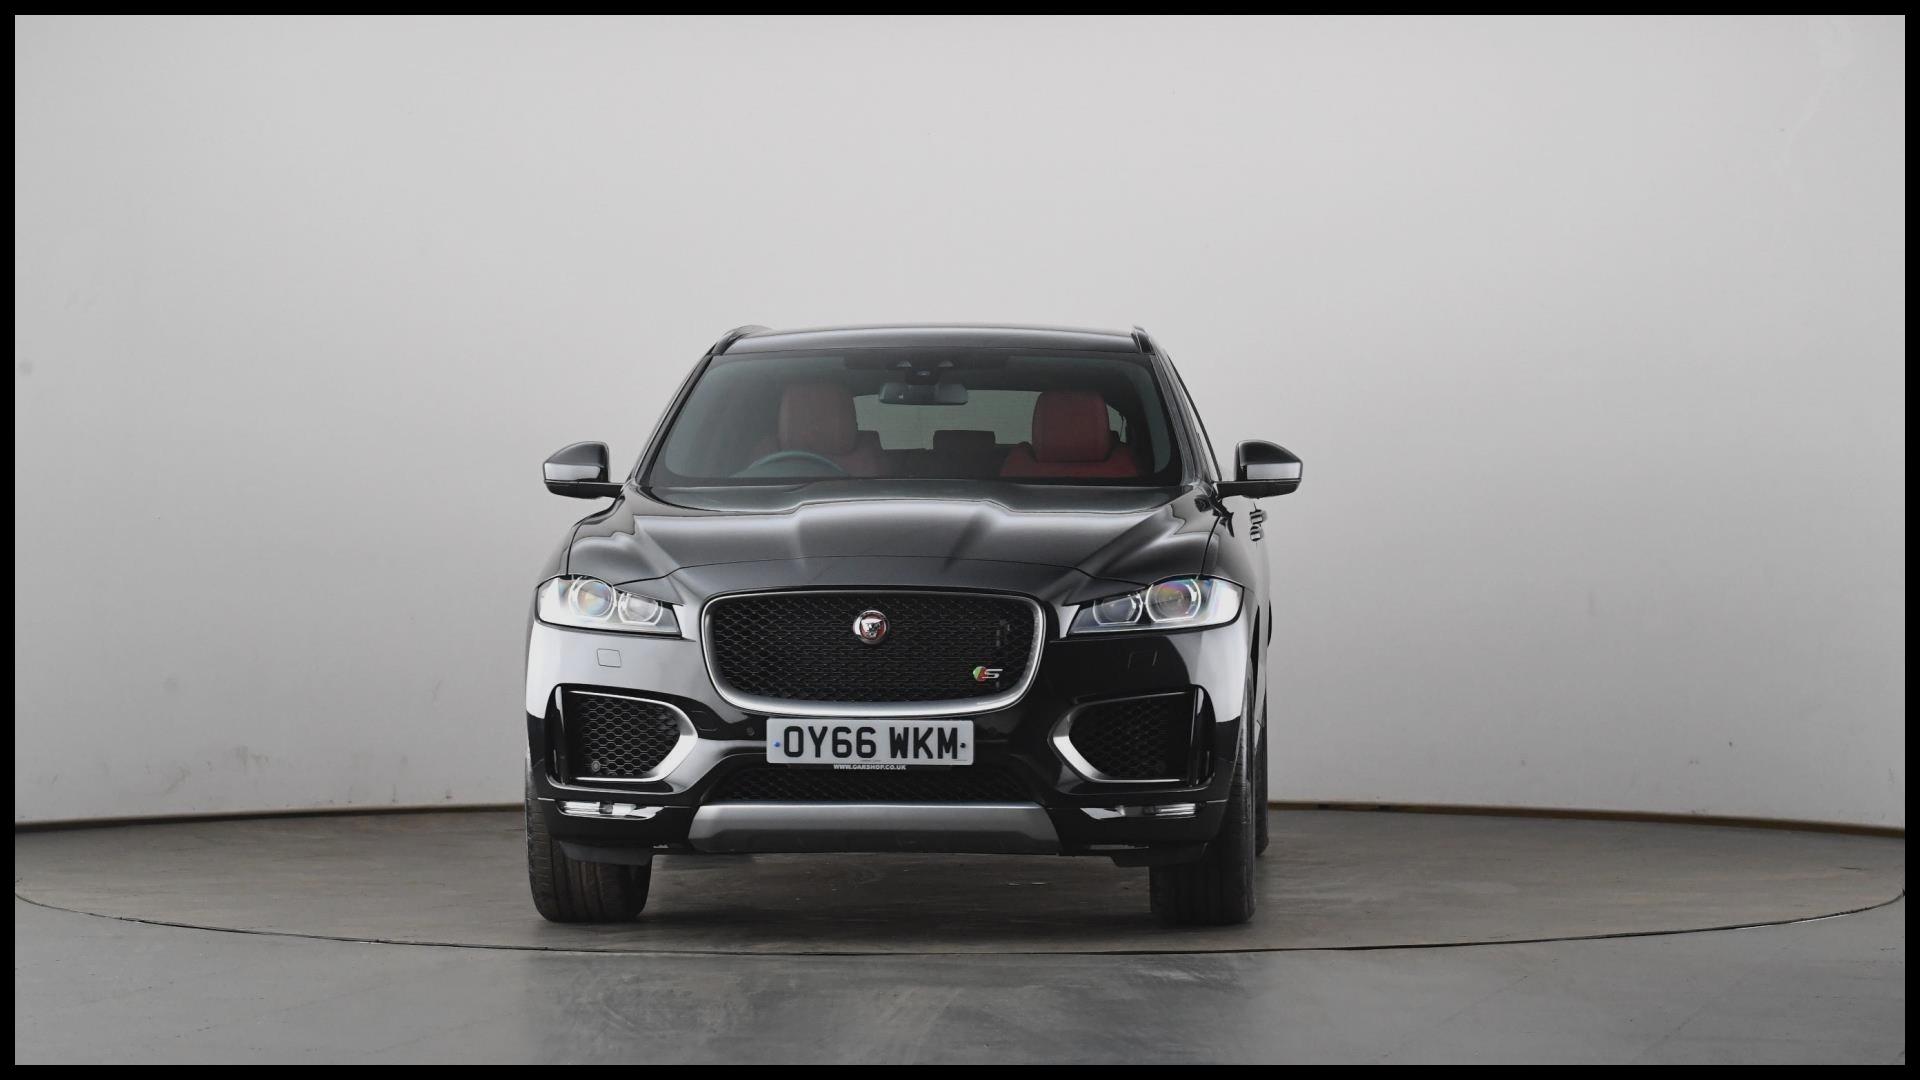 2018 Bmw X3 Fresh New Cars 2016 Stunning Innovative Black Cars S Bmw